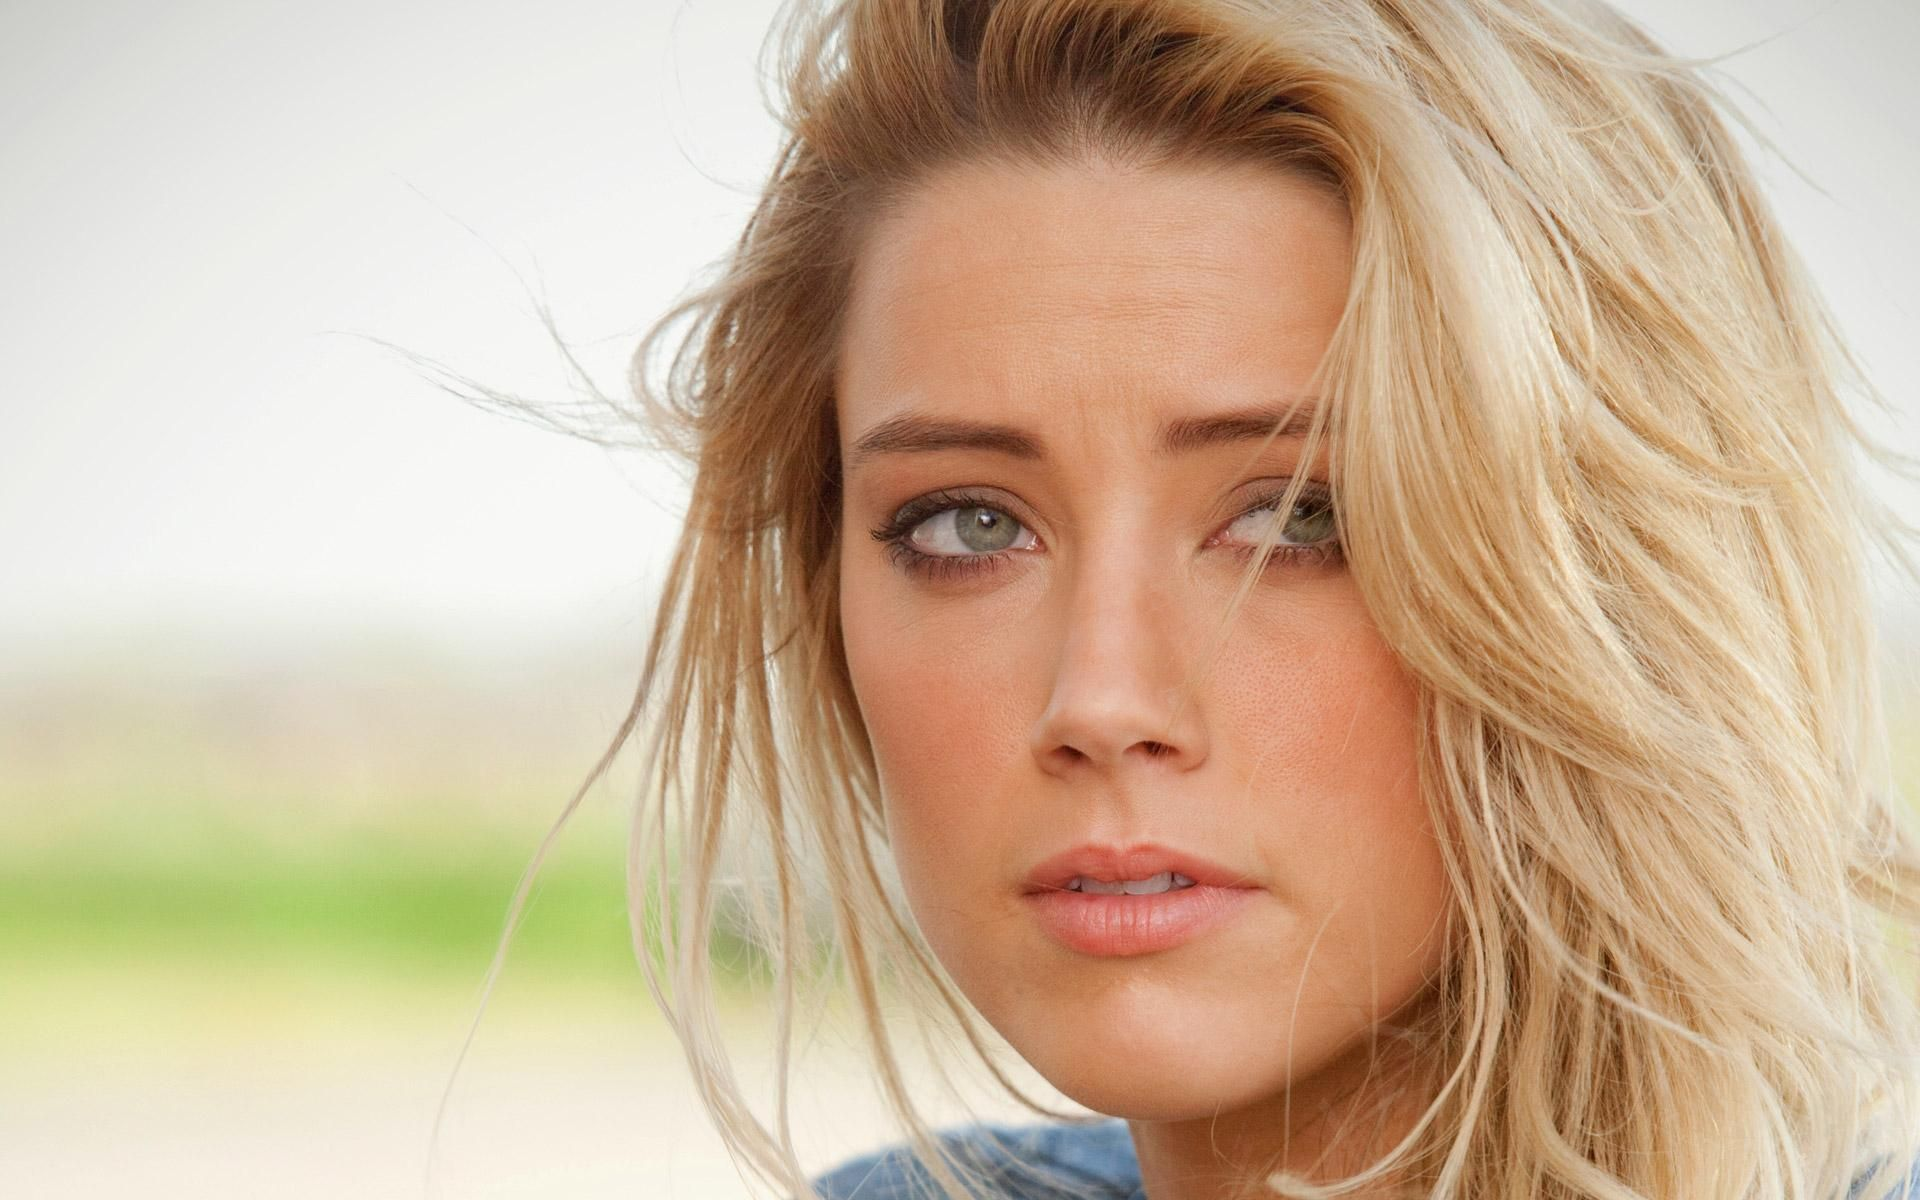 Amber Heard 17 best ideas about Amber Heard Wallpaper on Pinterest   Amber heard images, Amber heard hot and Amber heard zombieland